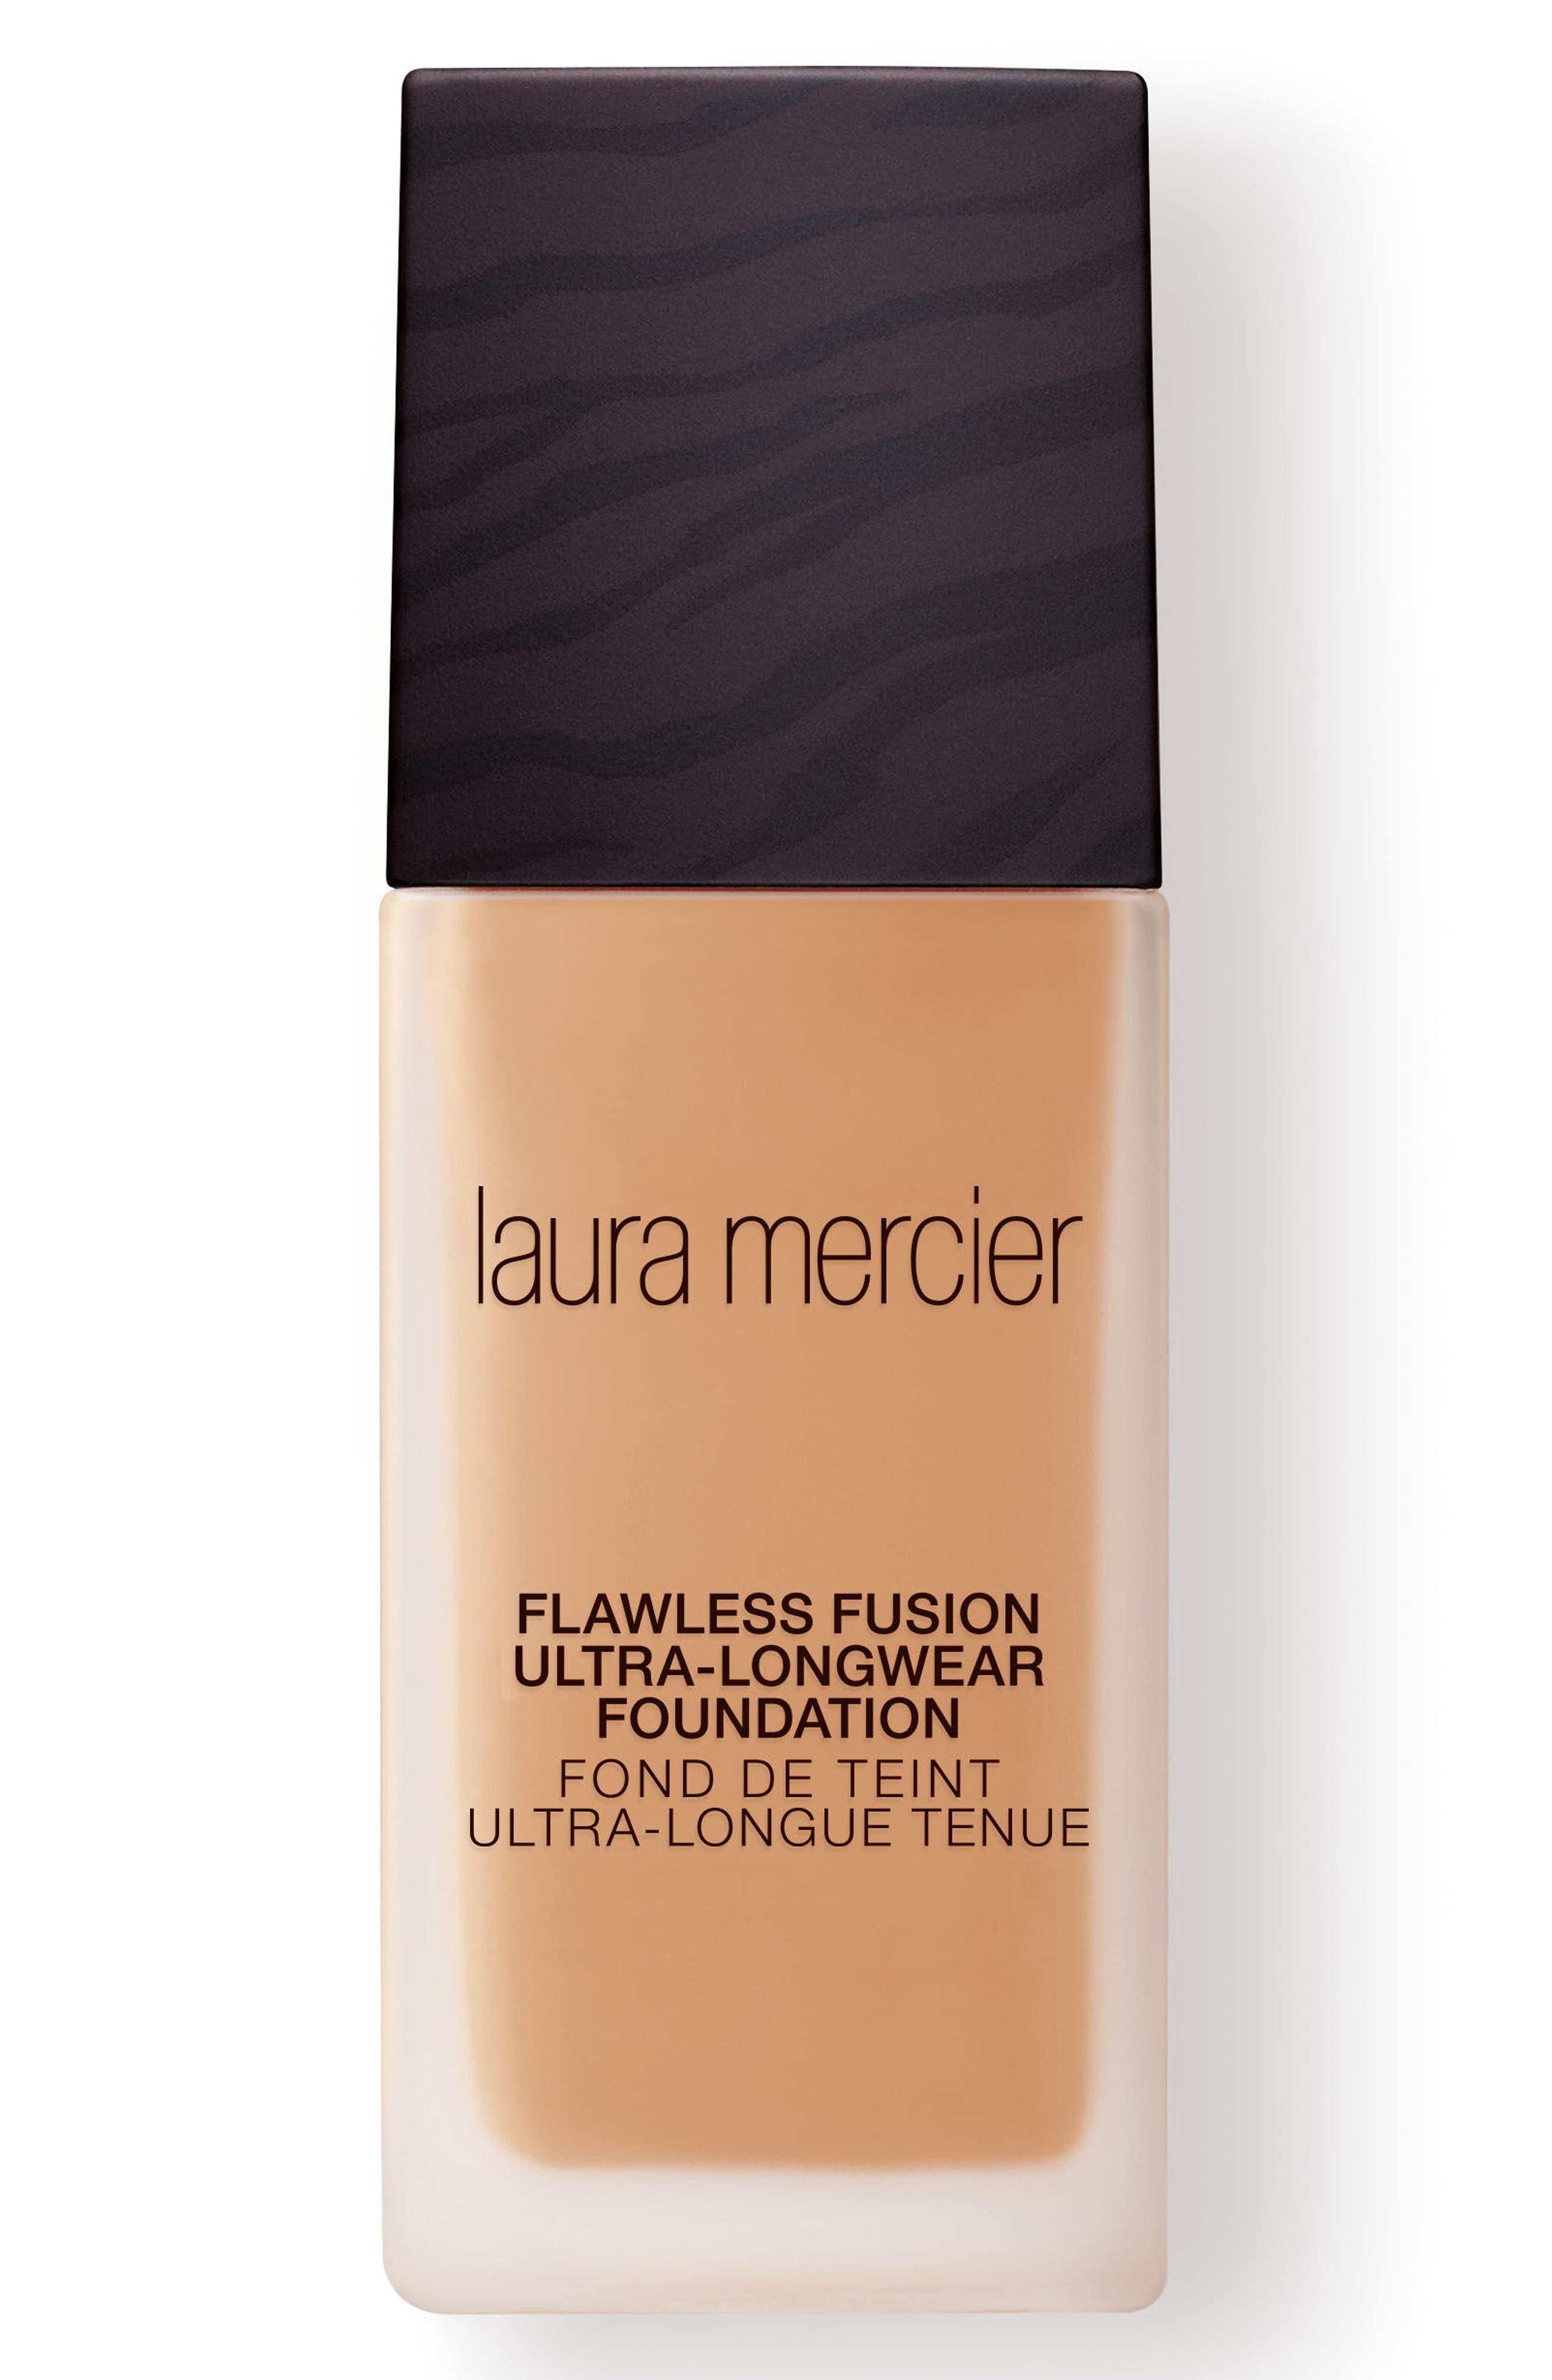 Alternate Image 1 Selected - Laura Mercier Flawless Fusion Ultra-Longwear Foundation